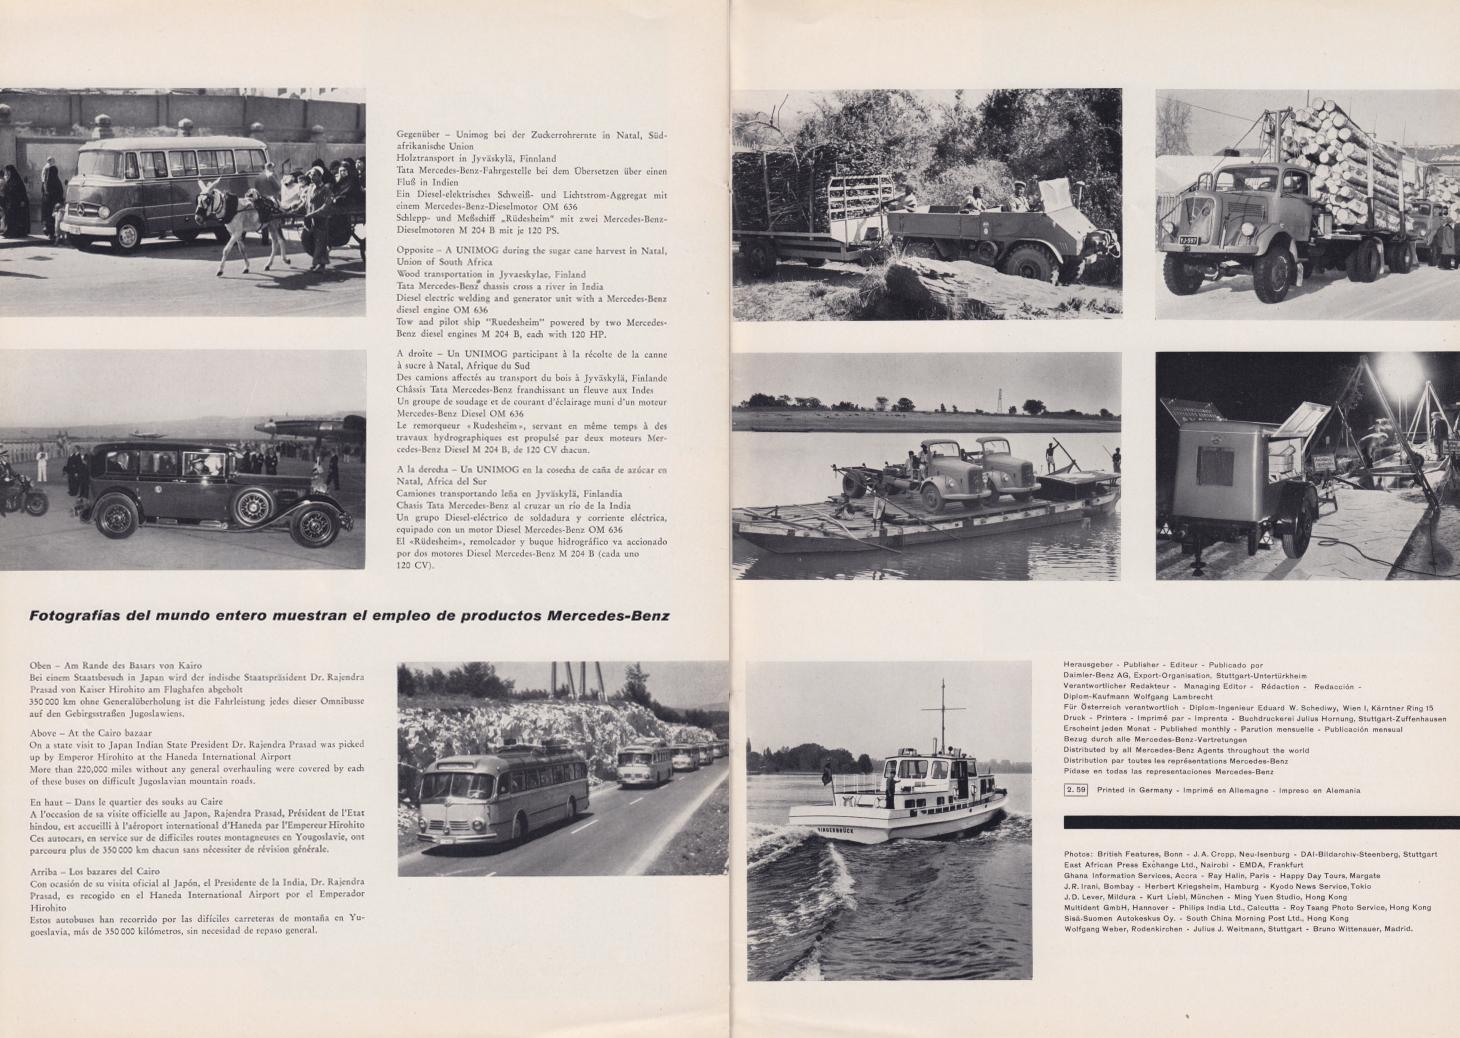 (REVISTA): Periódico In aller welt n.º 29 - Mercedes-Benz no mundo - 1959 - multilingue 012